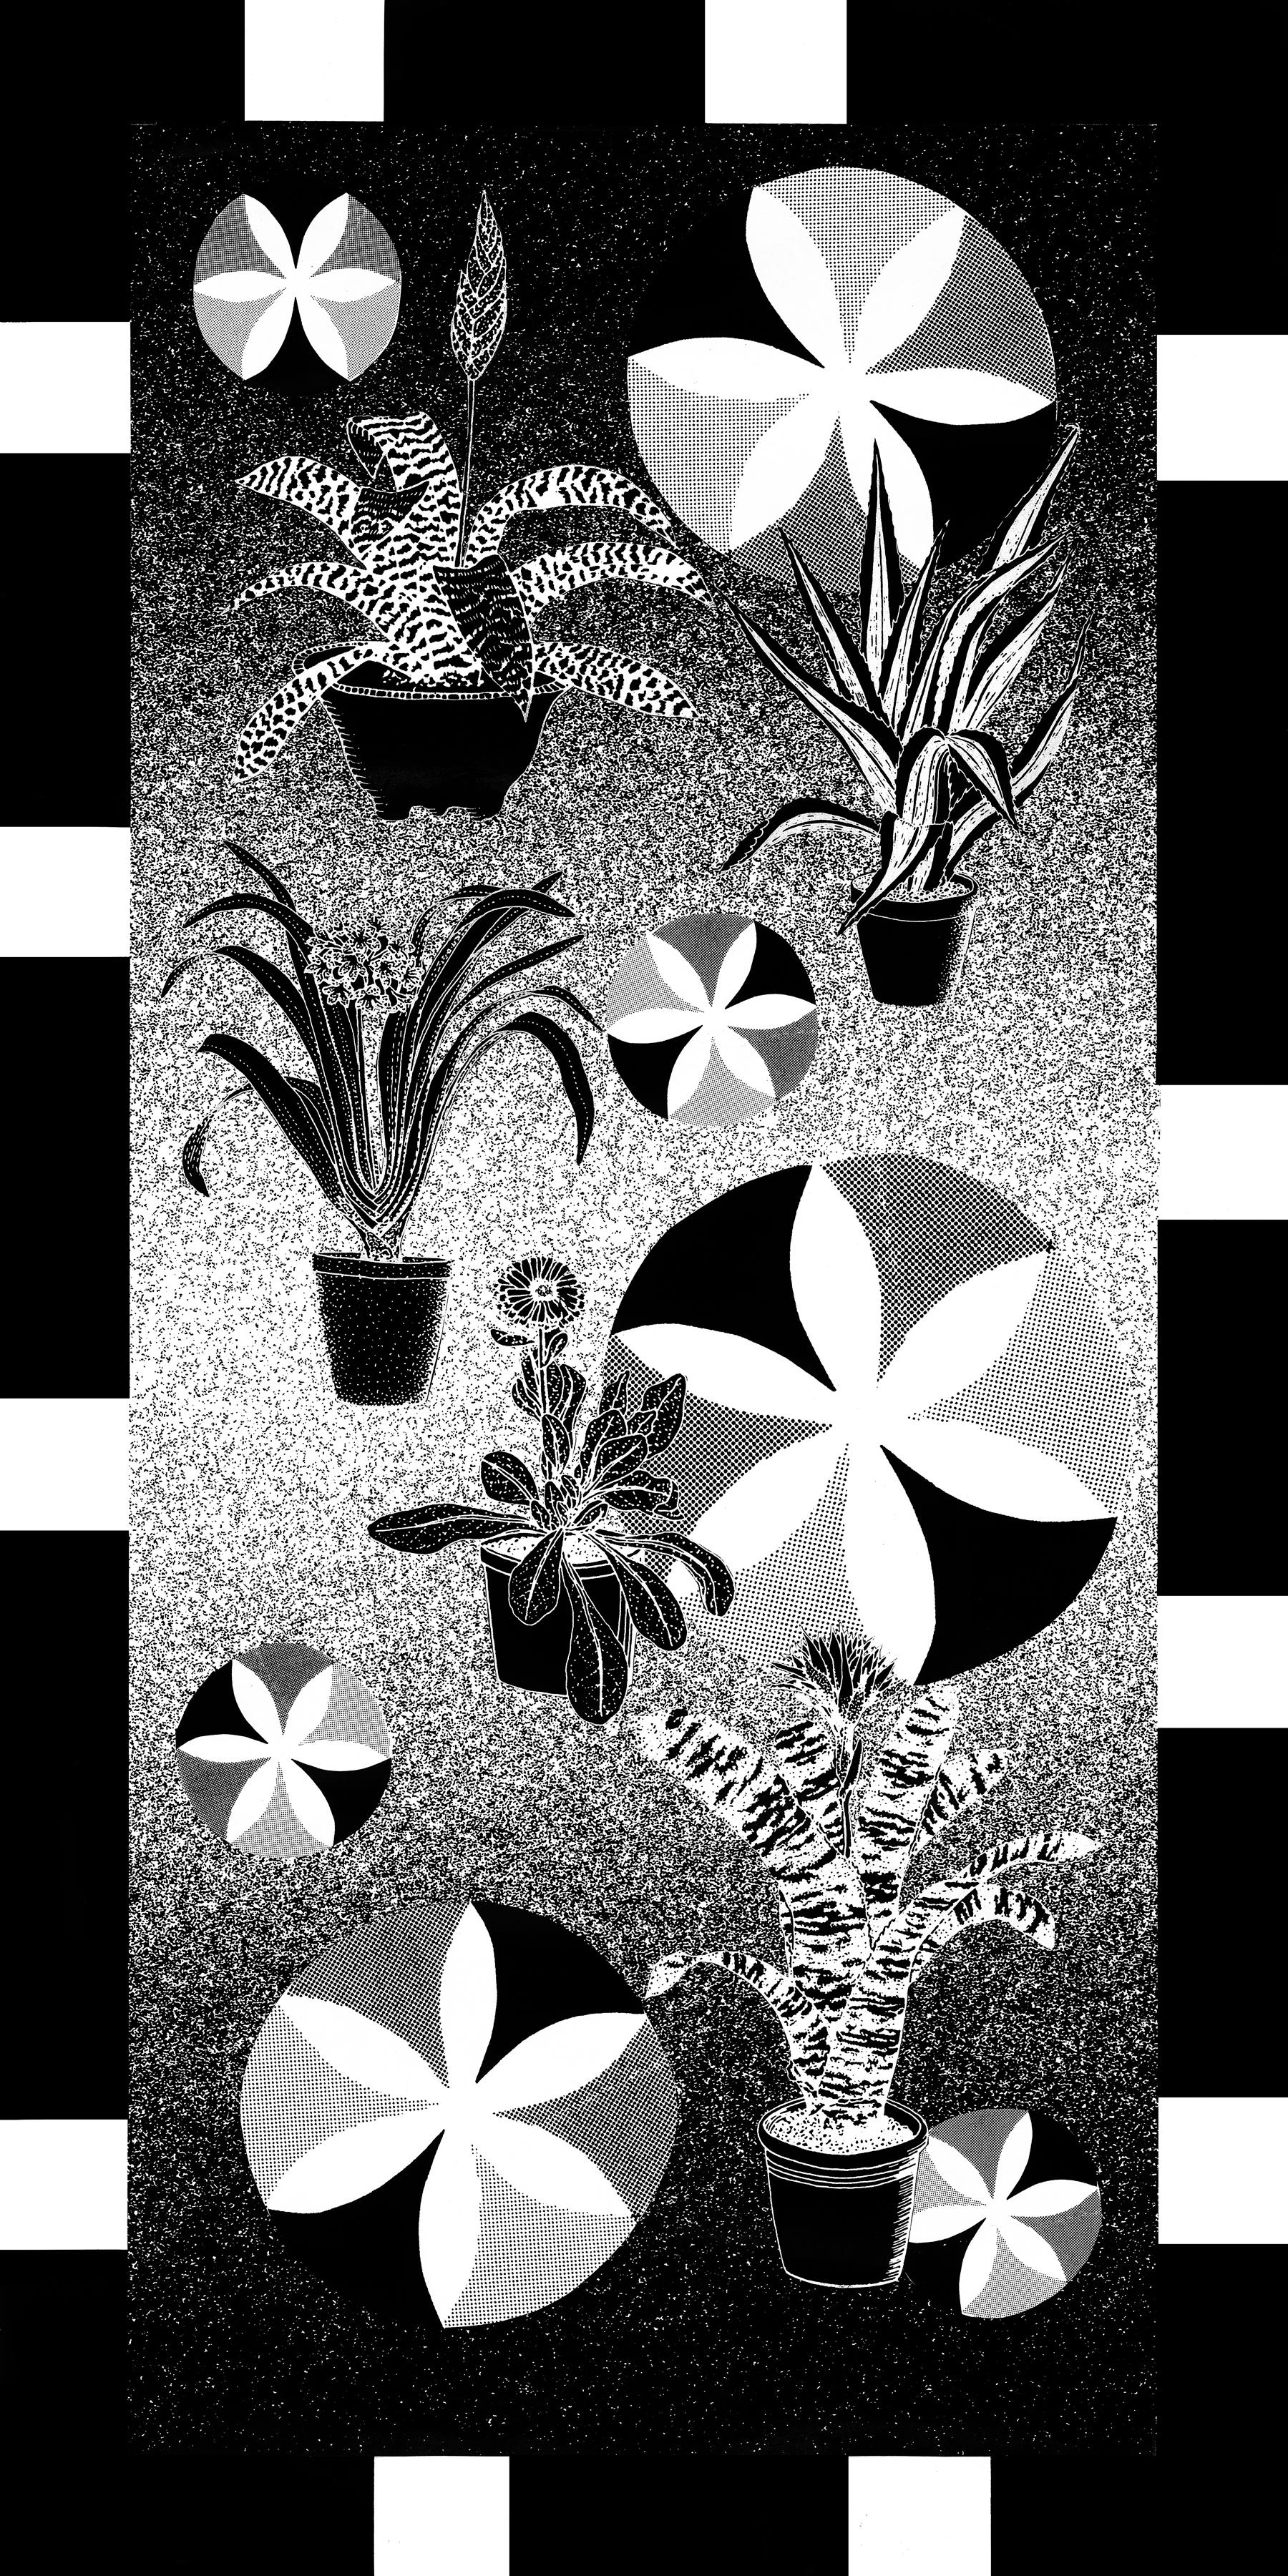 "Beach Towel  Alicia Nauta x Penny Arcade  60"" x 30"" cotton towel  Edition of 35  2017"